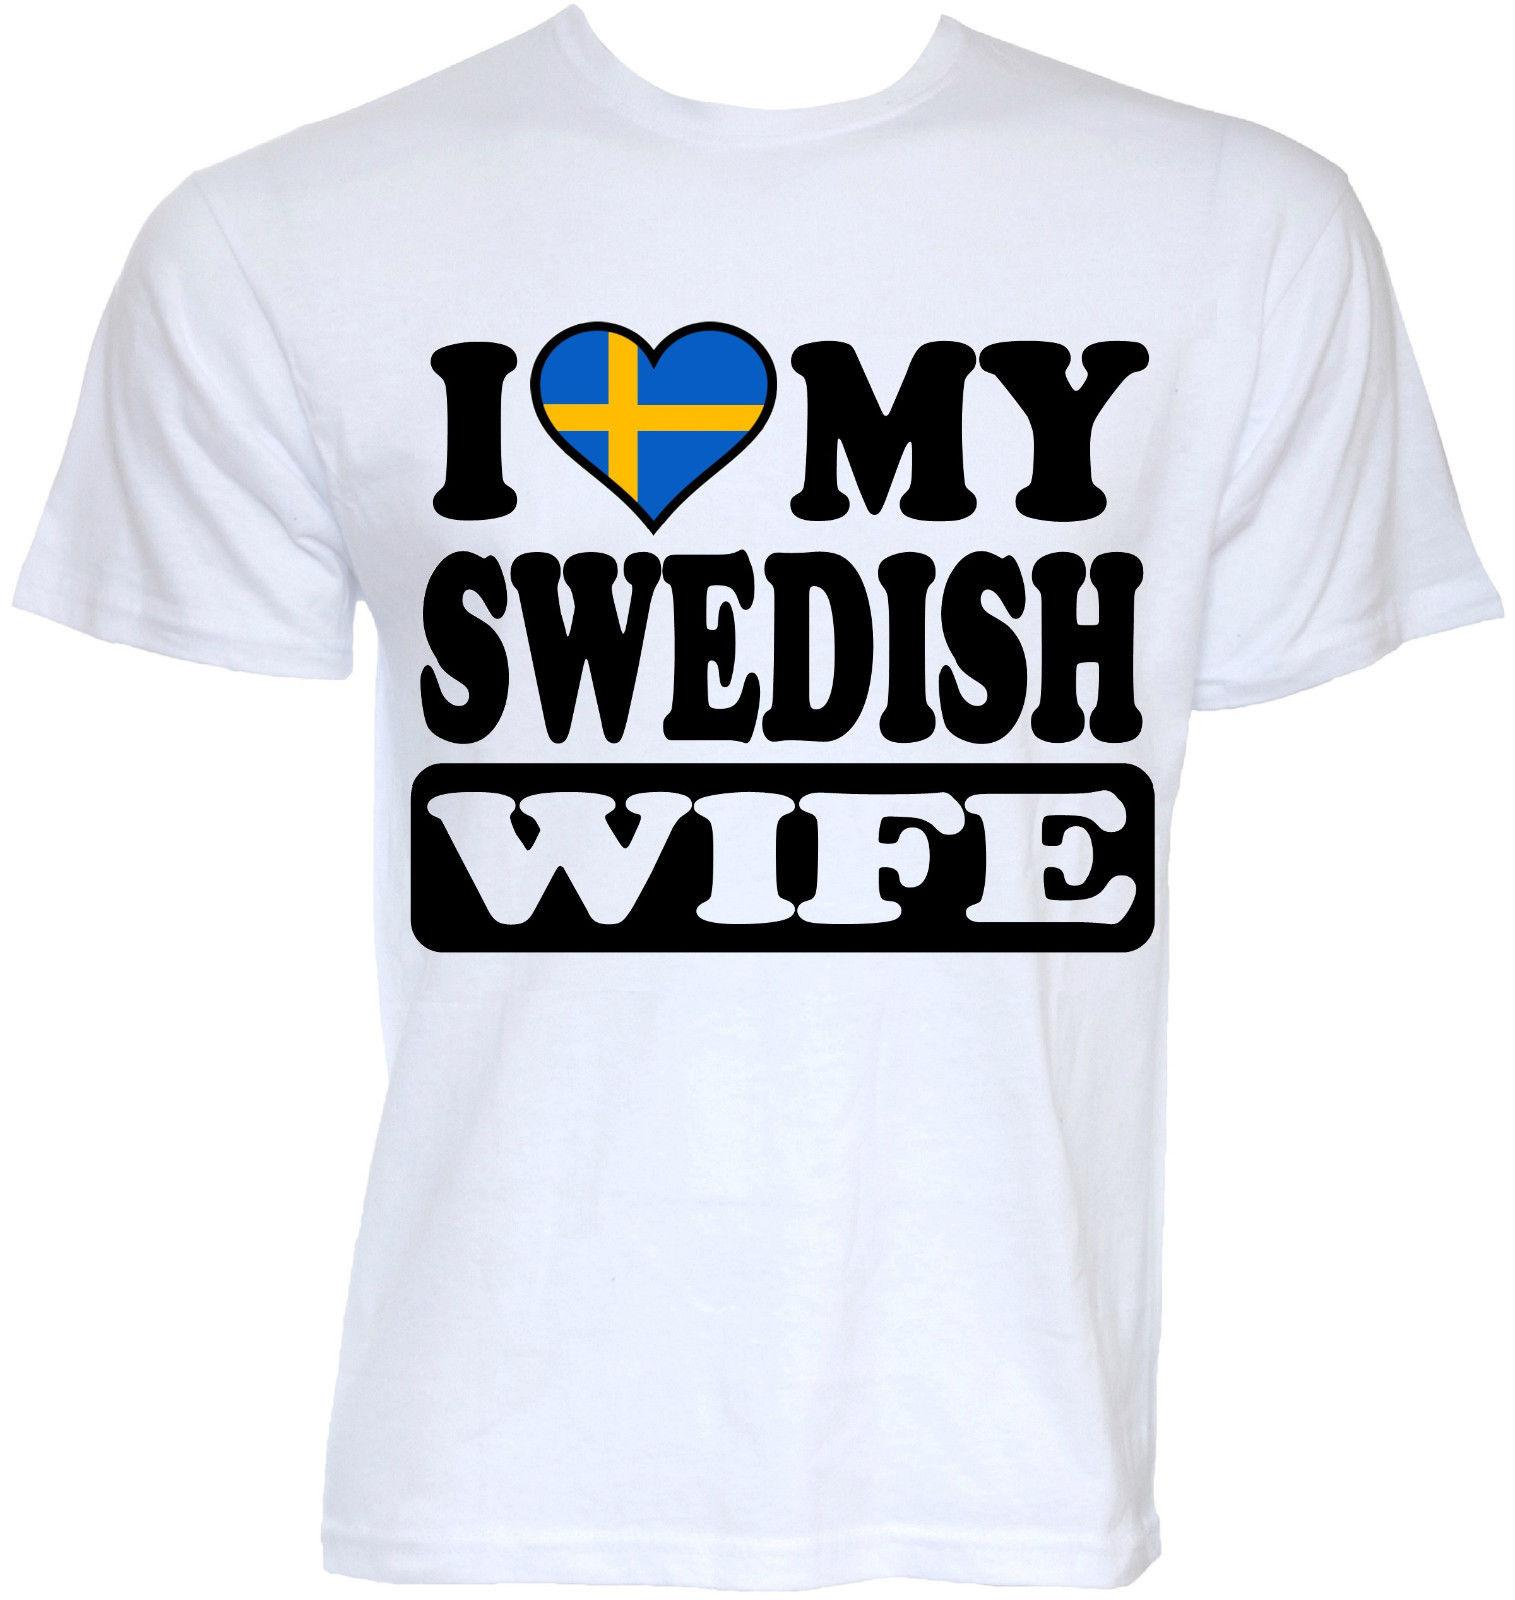 fbdfea64 Mens Funny Cool Novelty Swedish Wife Sweden Flag Joke Rude Slogan Gifts T  Shirts T Shirt Tops Summer Cool Funny T Shirt Graphic Tee Shirts T Shirt  Sayings ...